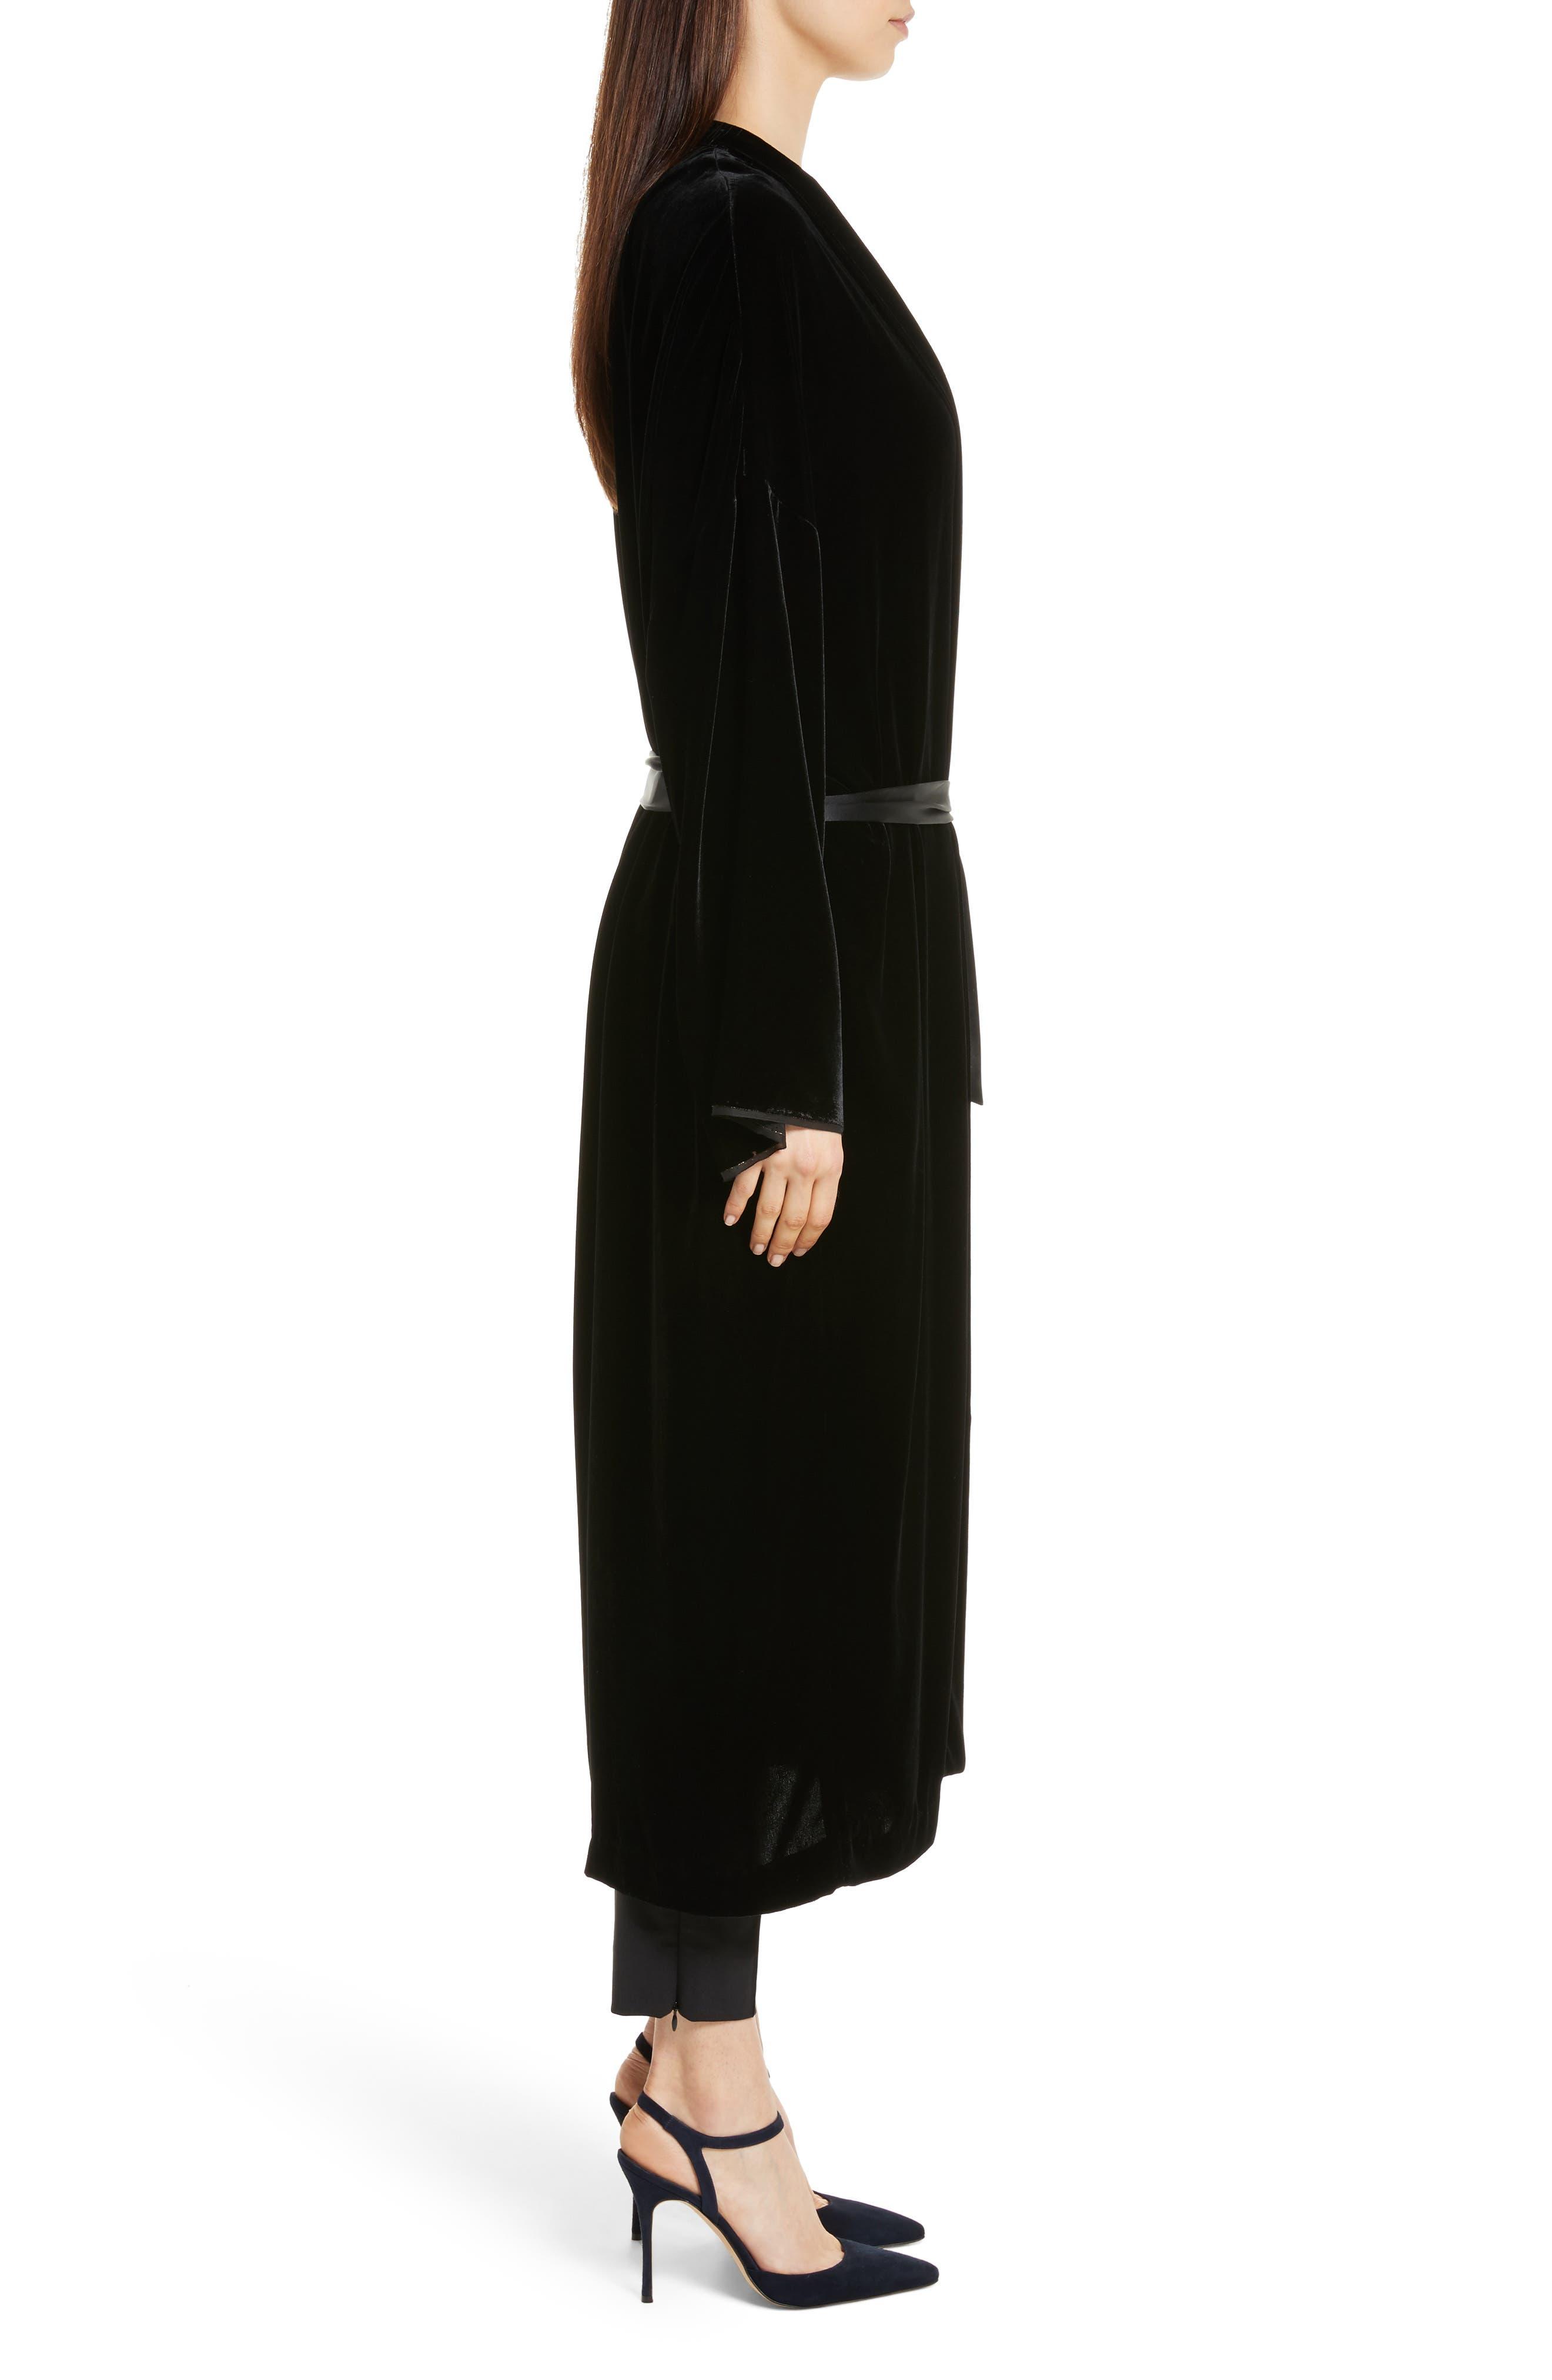 Muna Velvet Kimono,                             Alternate thumbnail 4, color,                             Black